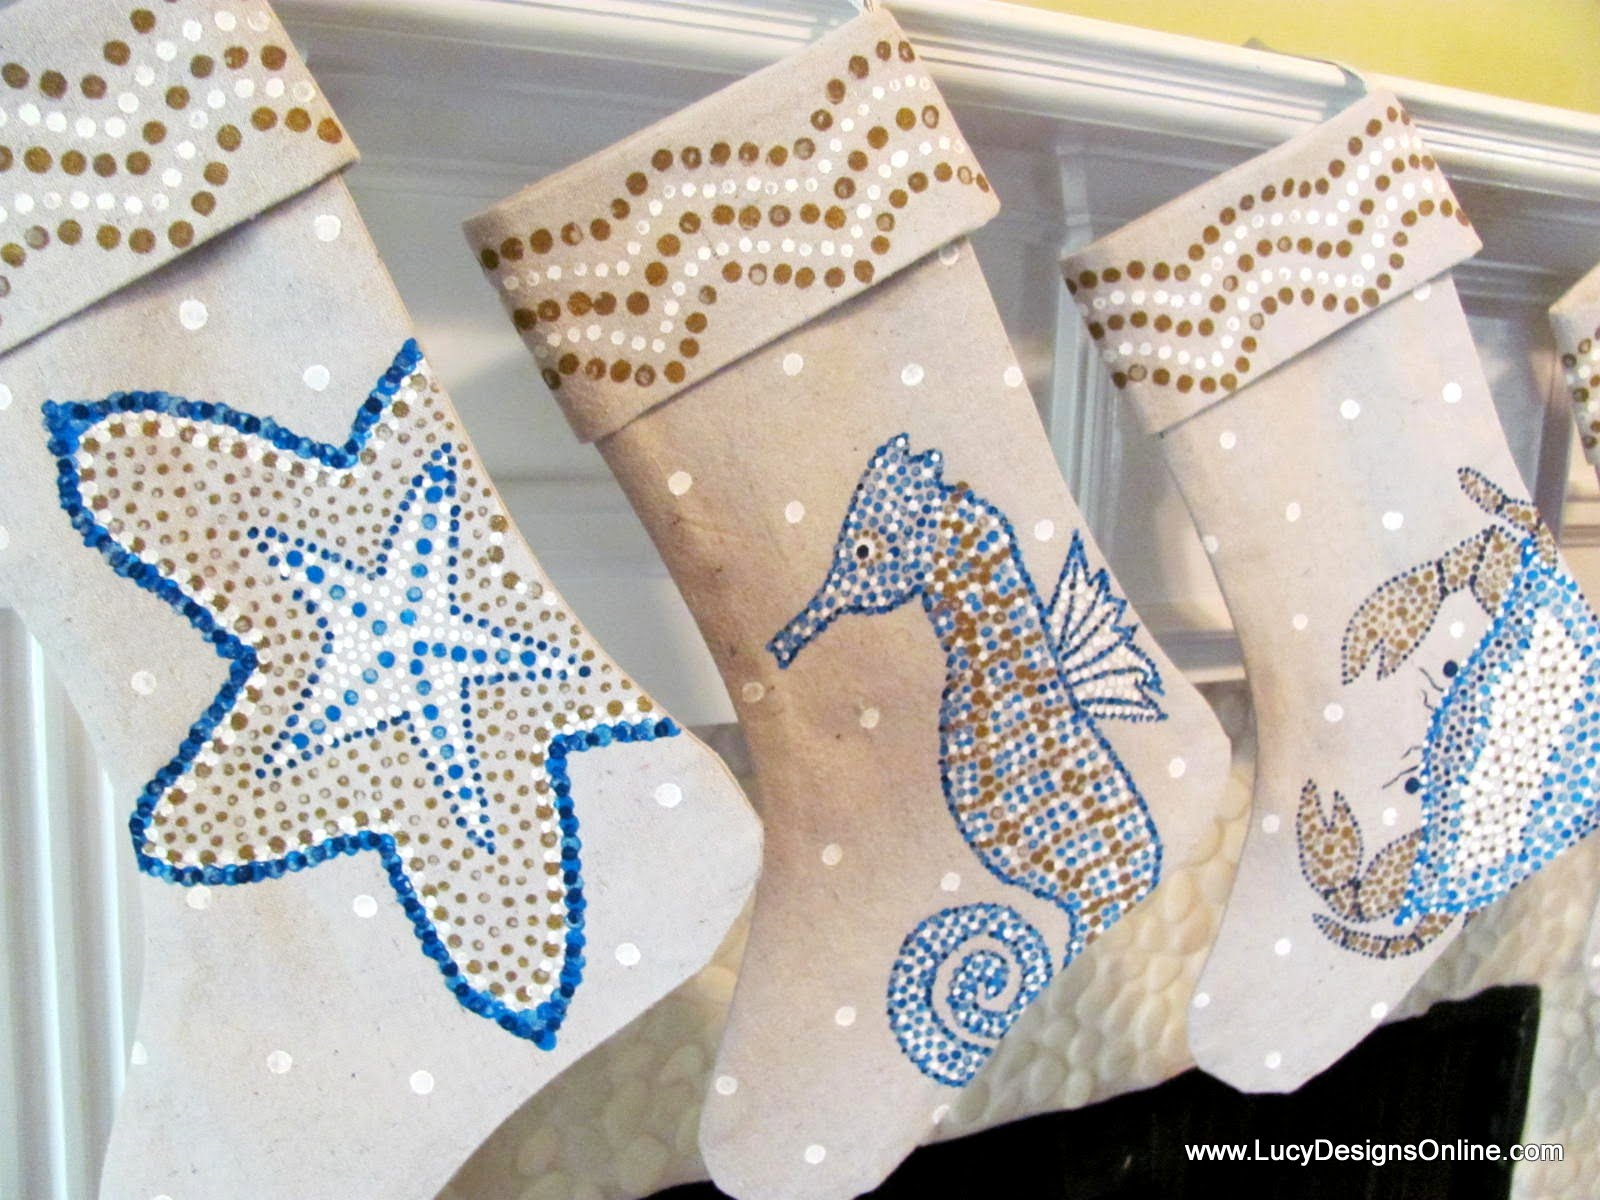 hand painted coastal beach christmas stockings - Coastal Christmas Stockings